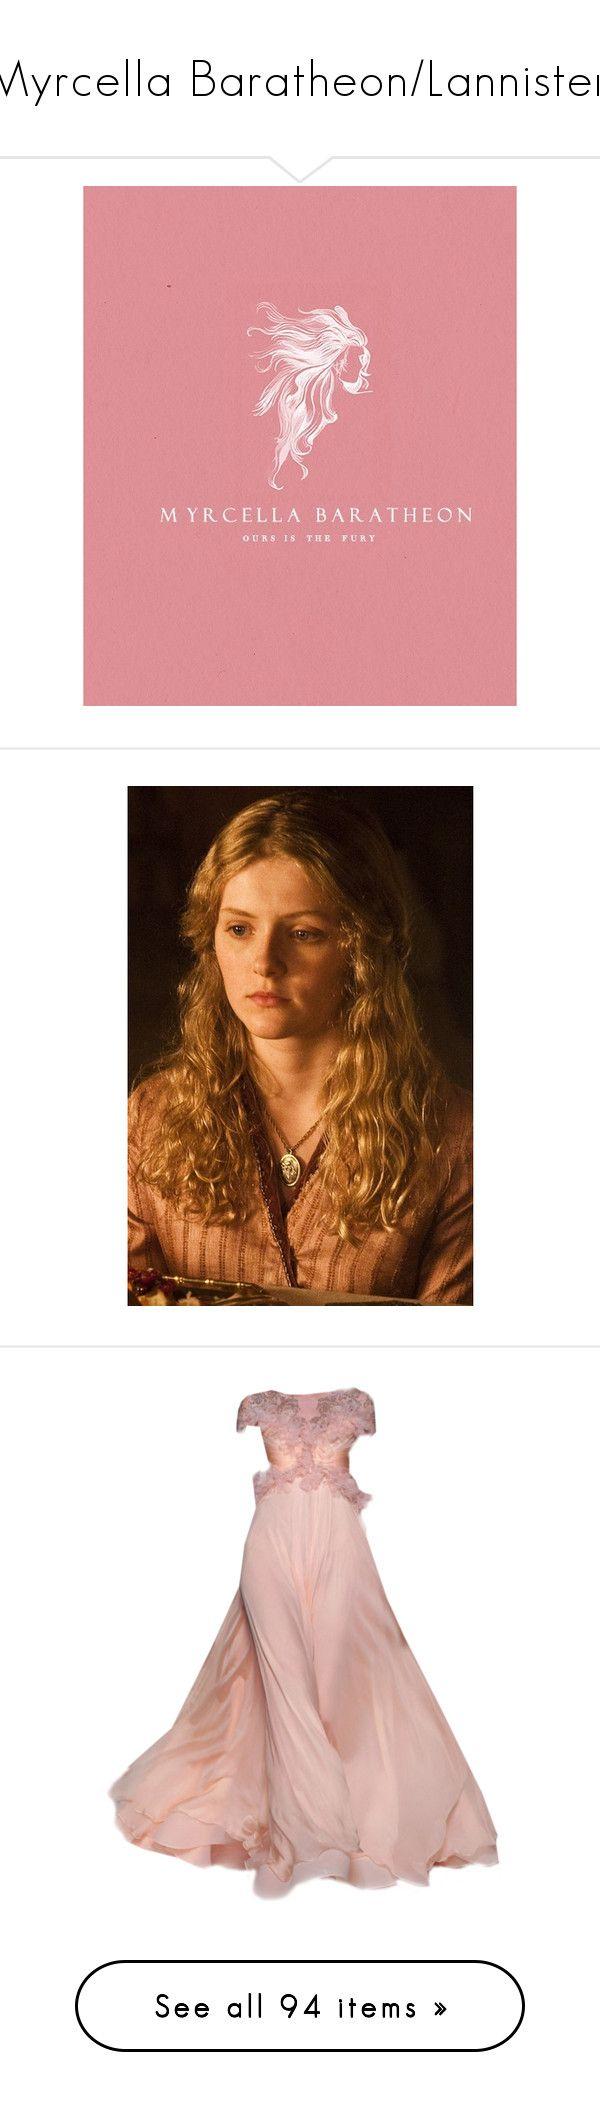 """Myrcella Baratheon/Lannister."" by lillian-pandola ❤ liked on Polyvore featuring got, asoiaf, myrcellabaratheon, gameofthones, game of thrones, myrcella, models, house baratheon, flowers and fillers"